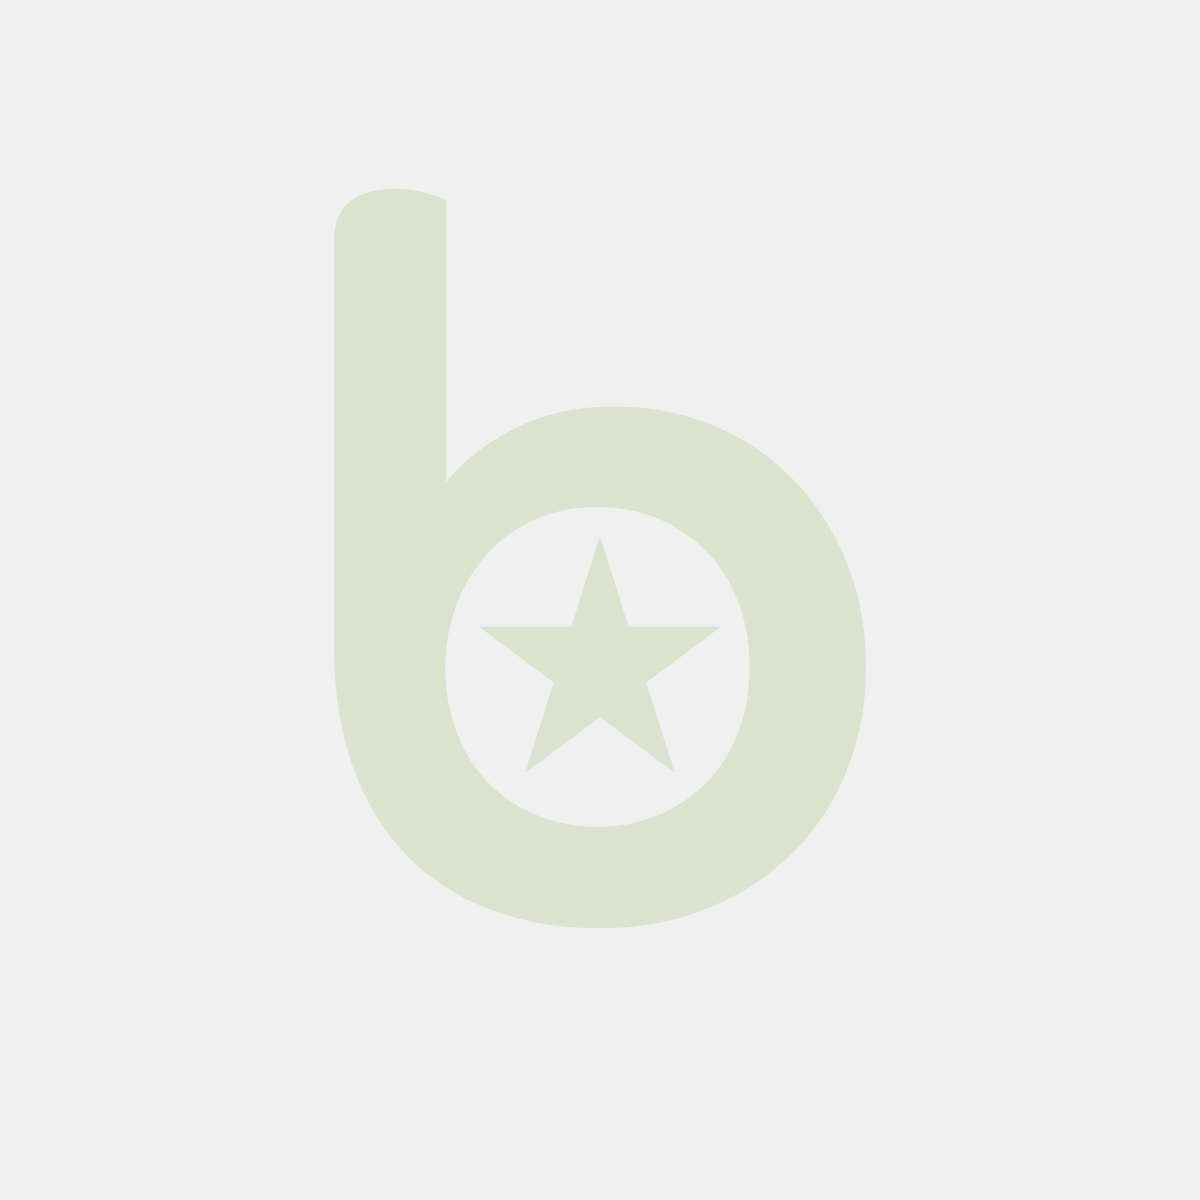 FINGERFOOD - kubek 200ml PS transparentna 8x8x6,3 op. 12 sztuk